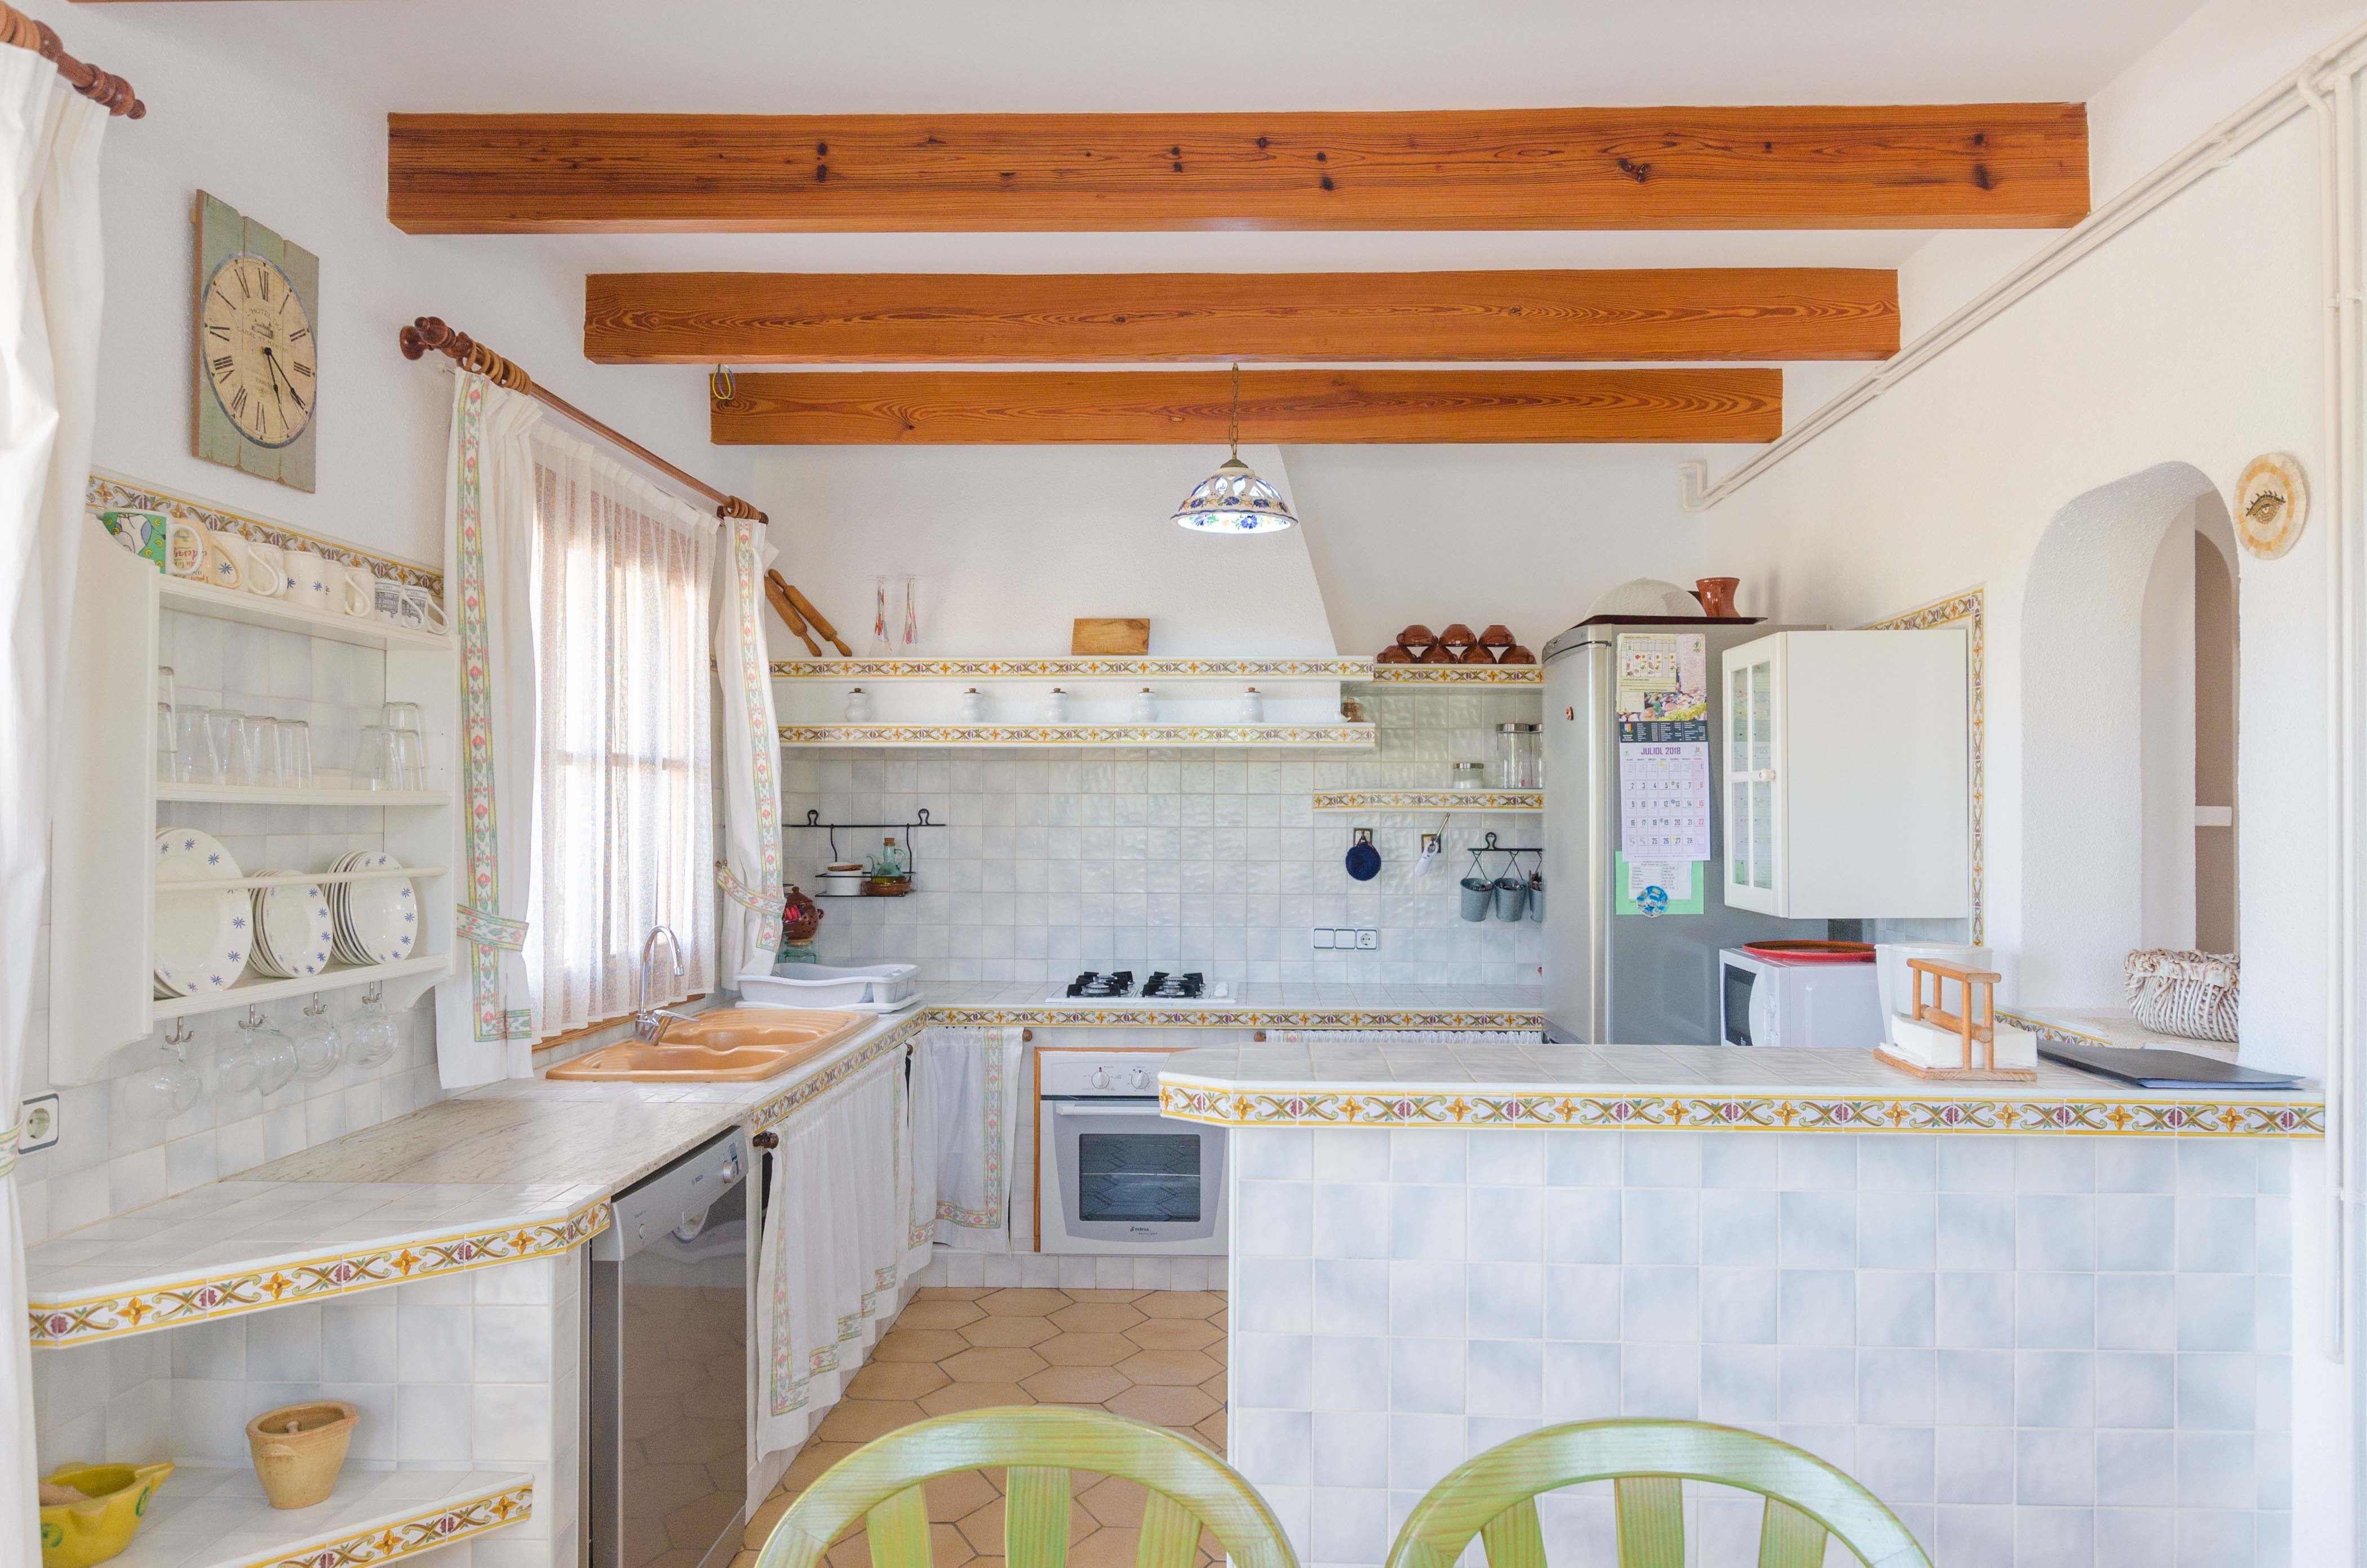 Maison de vacances SA SINIA (2374876), Lloret de Vistalegre, Majorque, Iles Baléares, Espagne, image 19